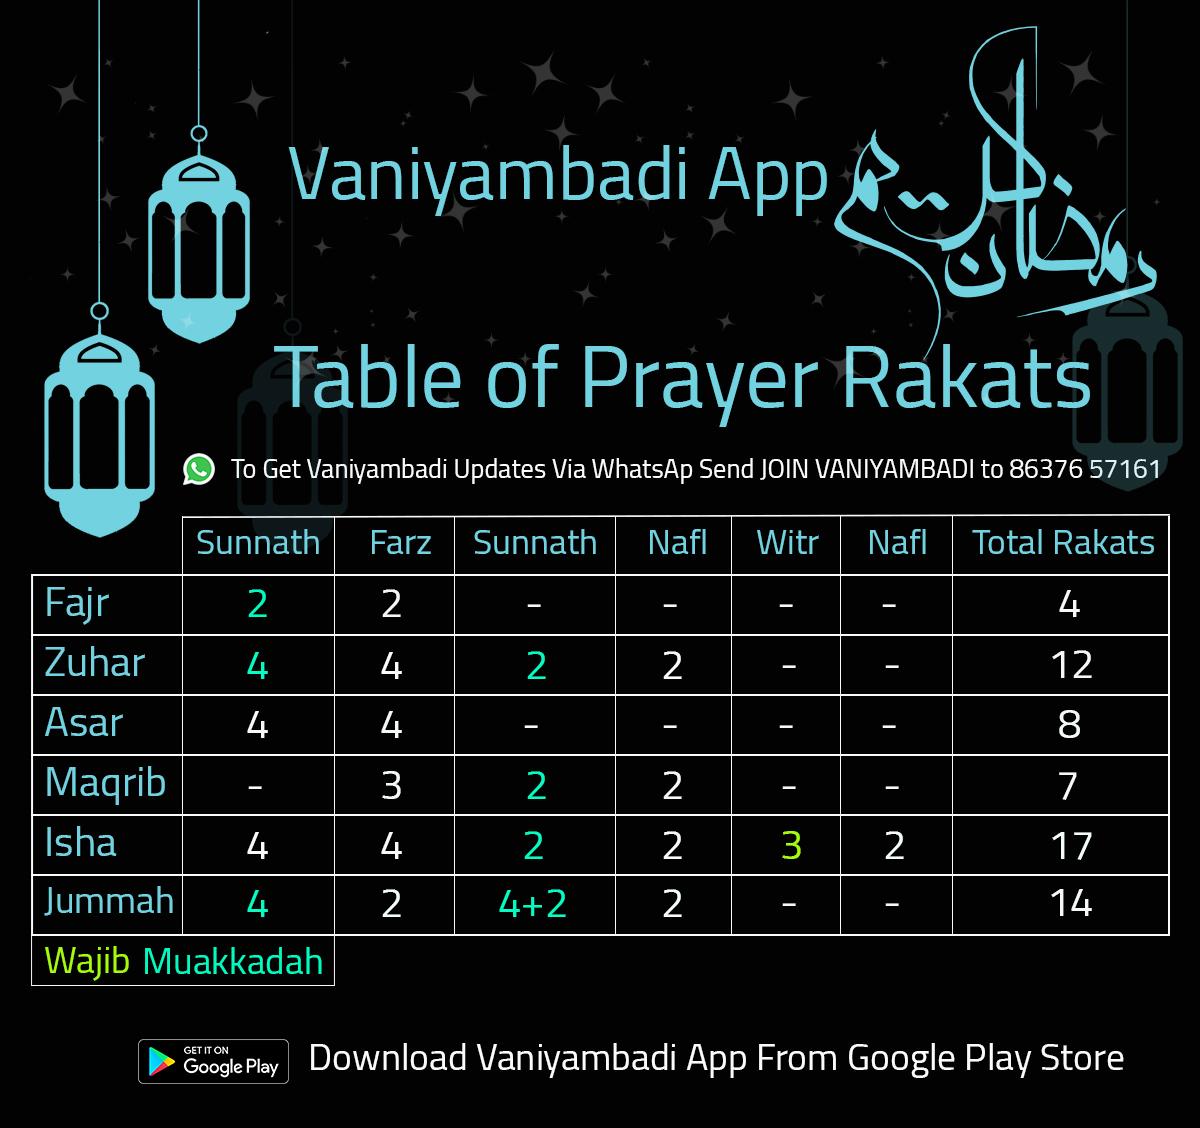 Table of Prayer Rakats